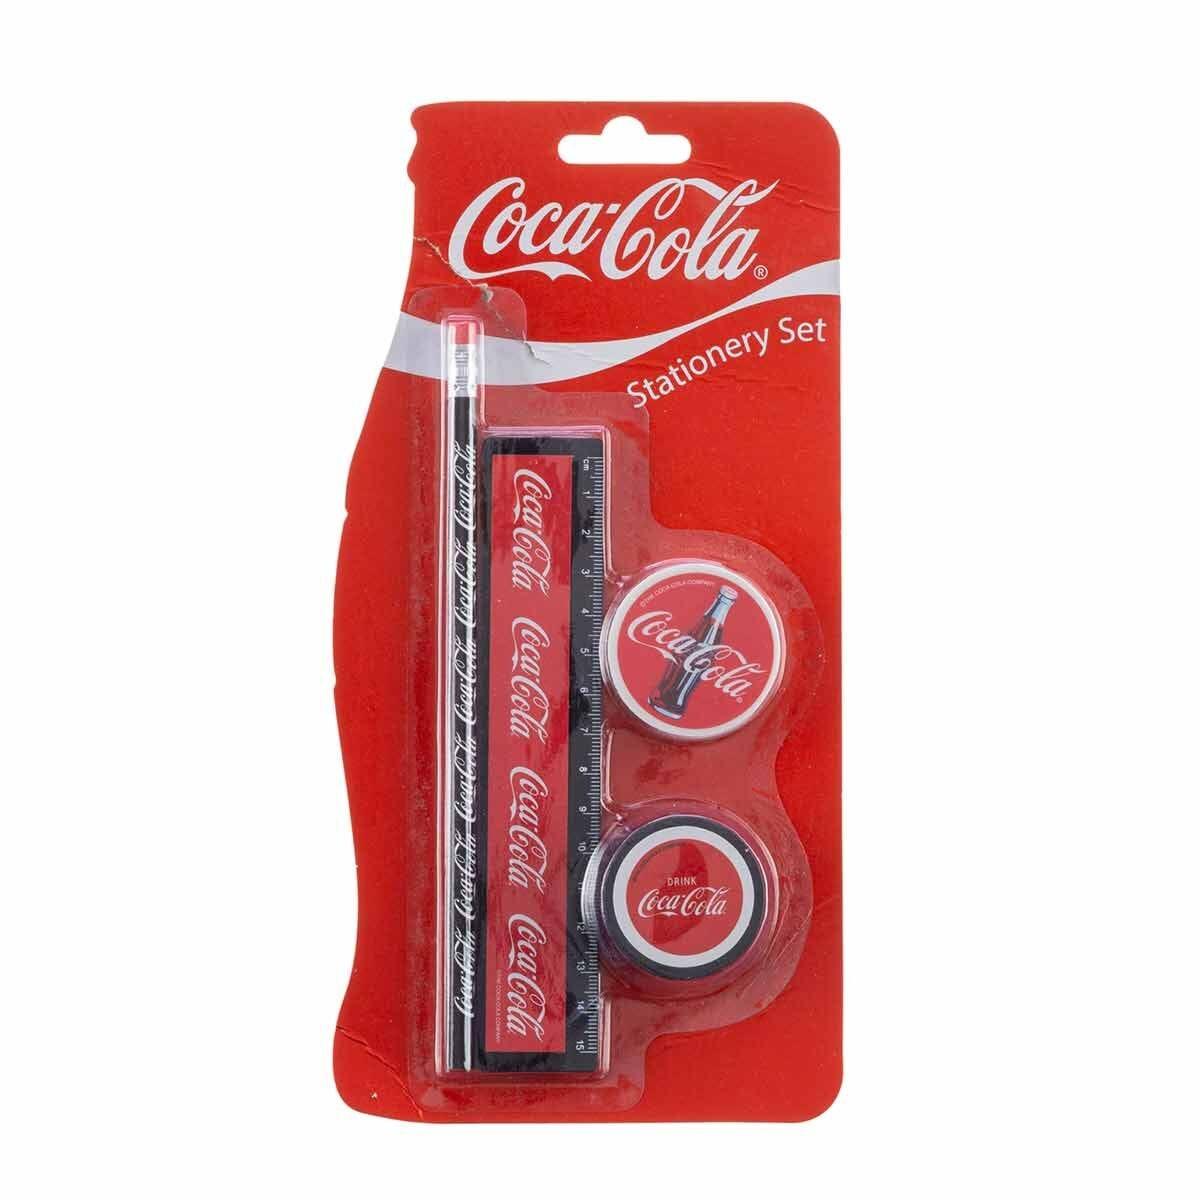 Coke Stationery Set